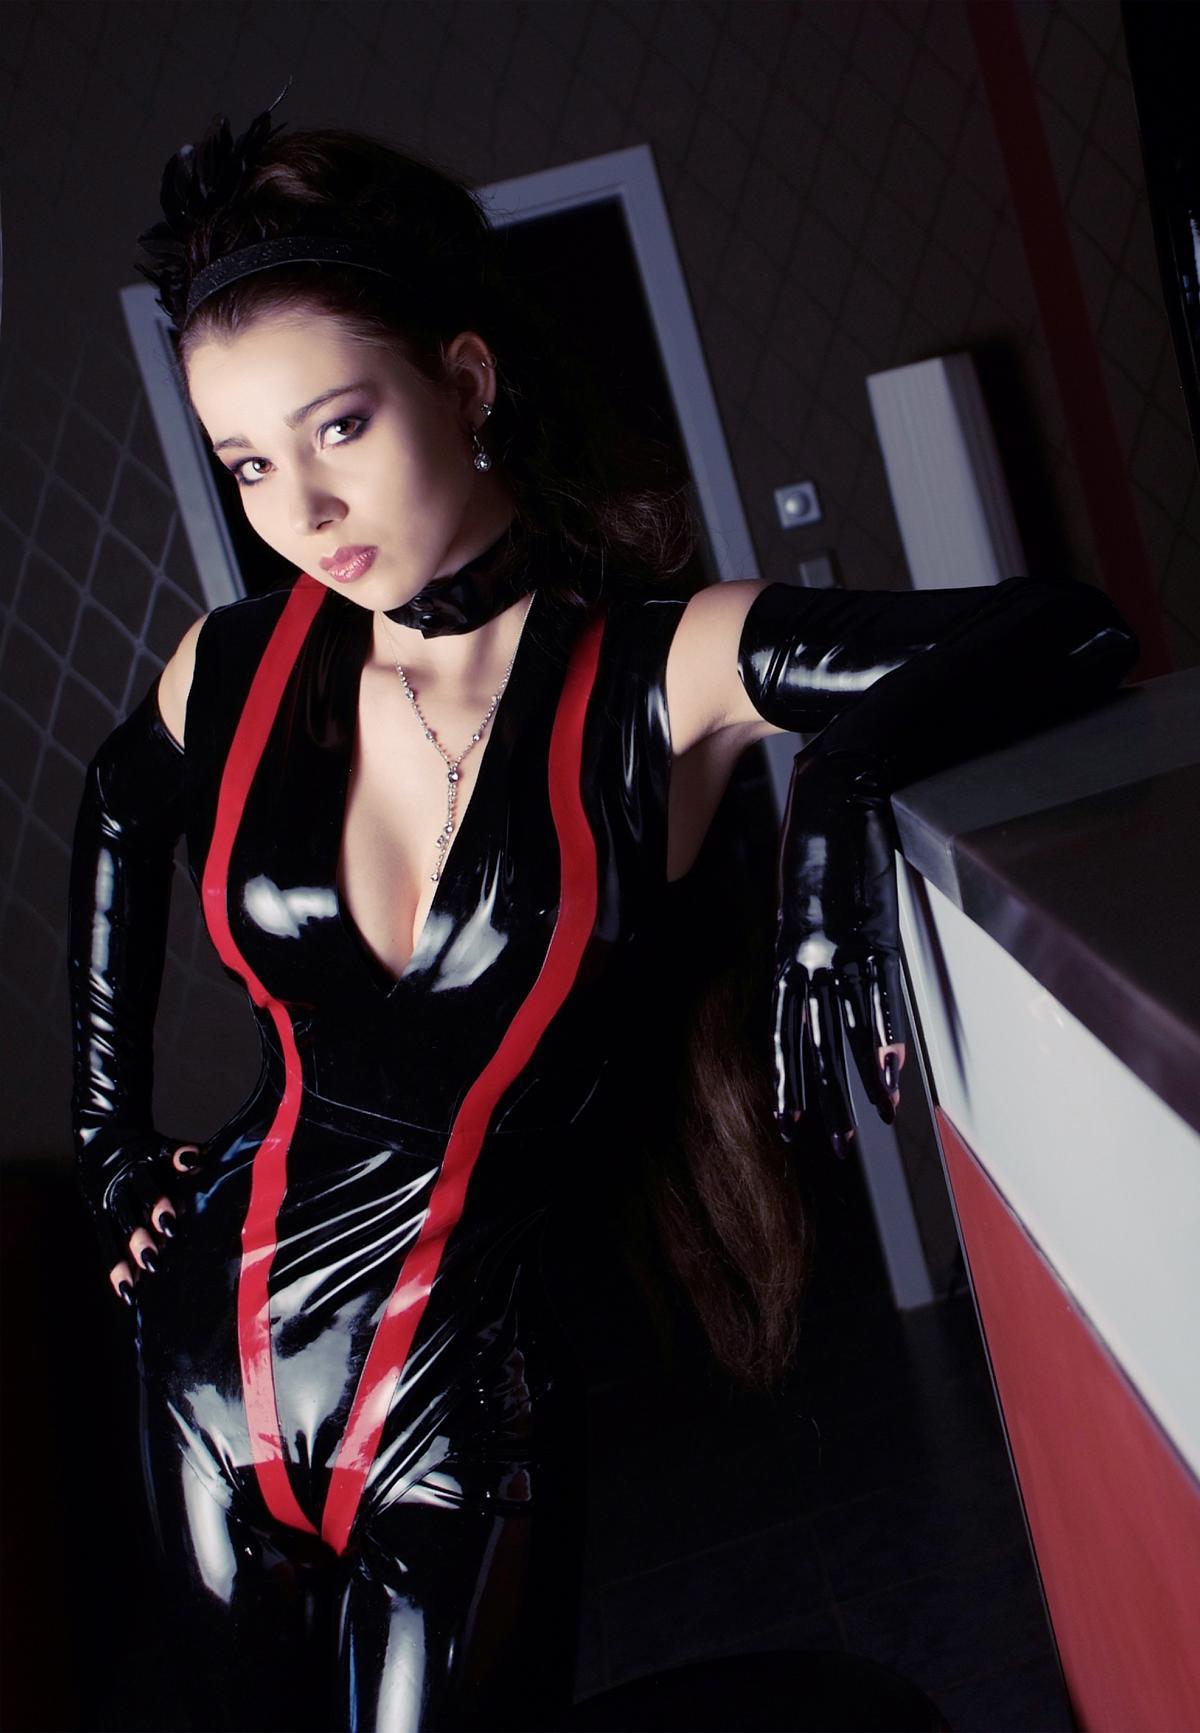 Lady Kira Page - Berlin - VIP Mistresses - World Mistresses